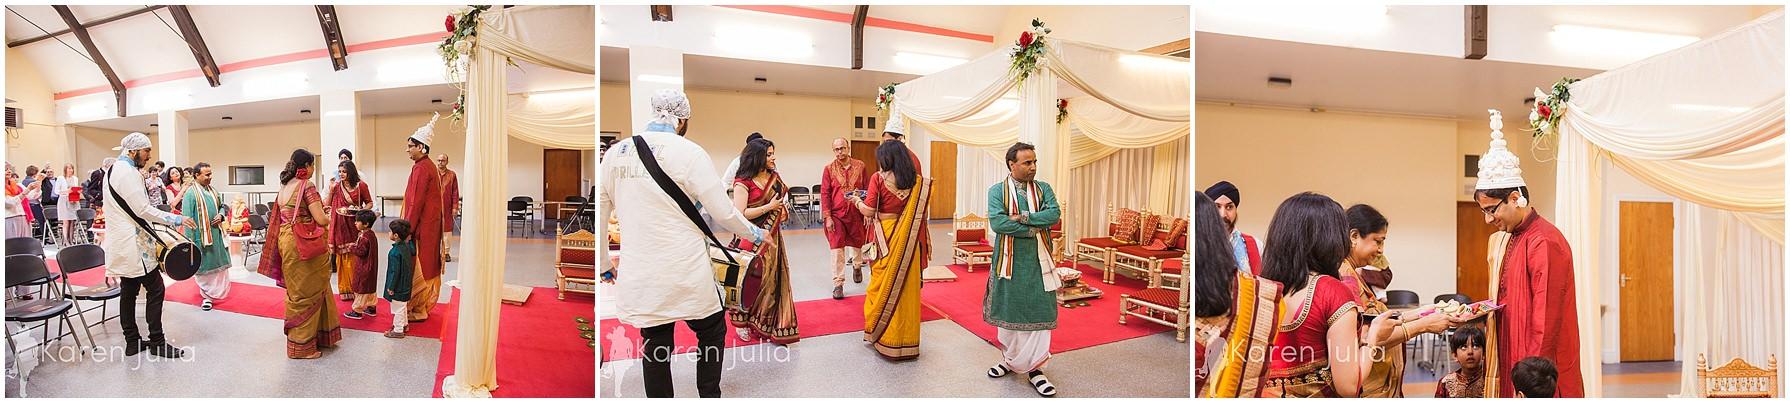 wedding ceremony at Gita Bhavan hindu temple